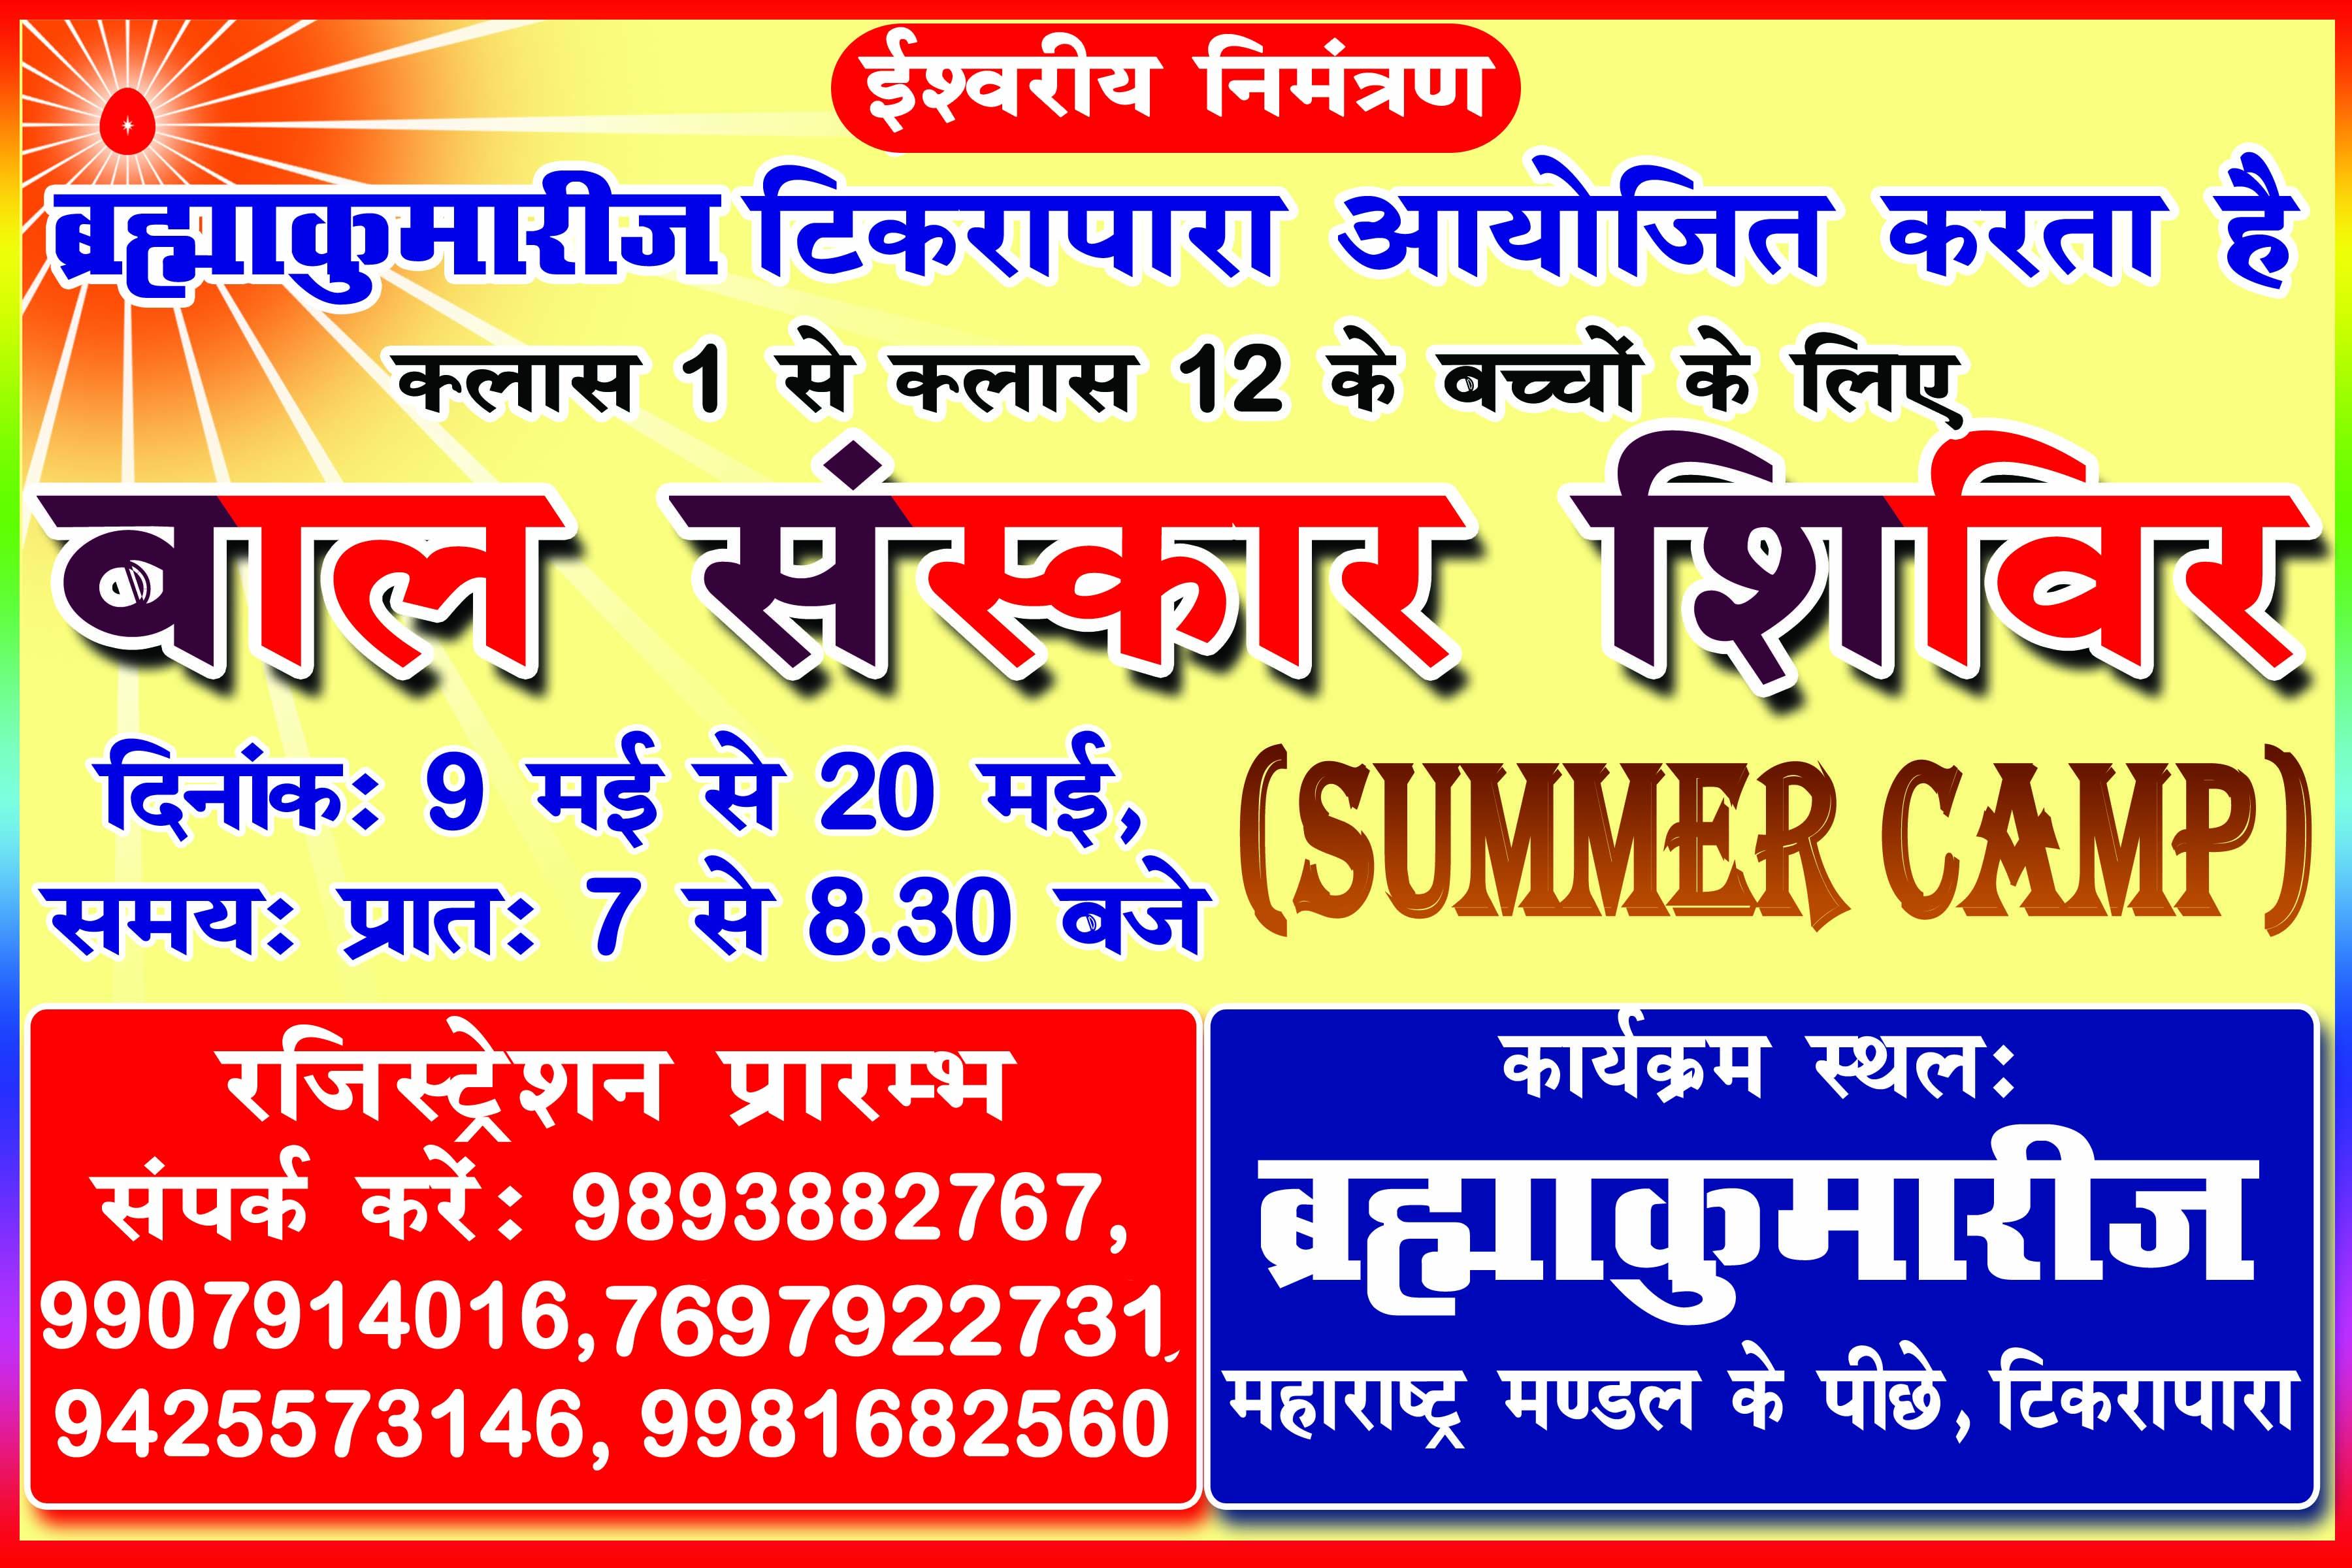 ooobaal Sanskar Camp4x6 copy